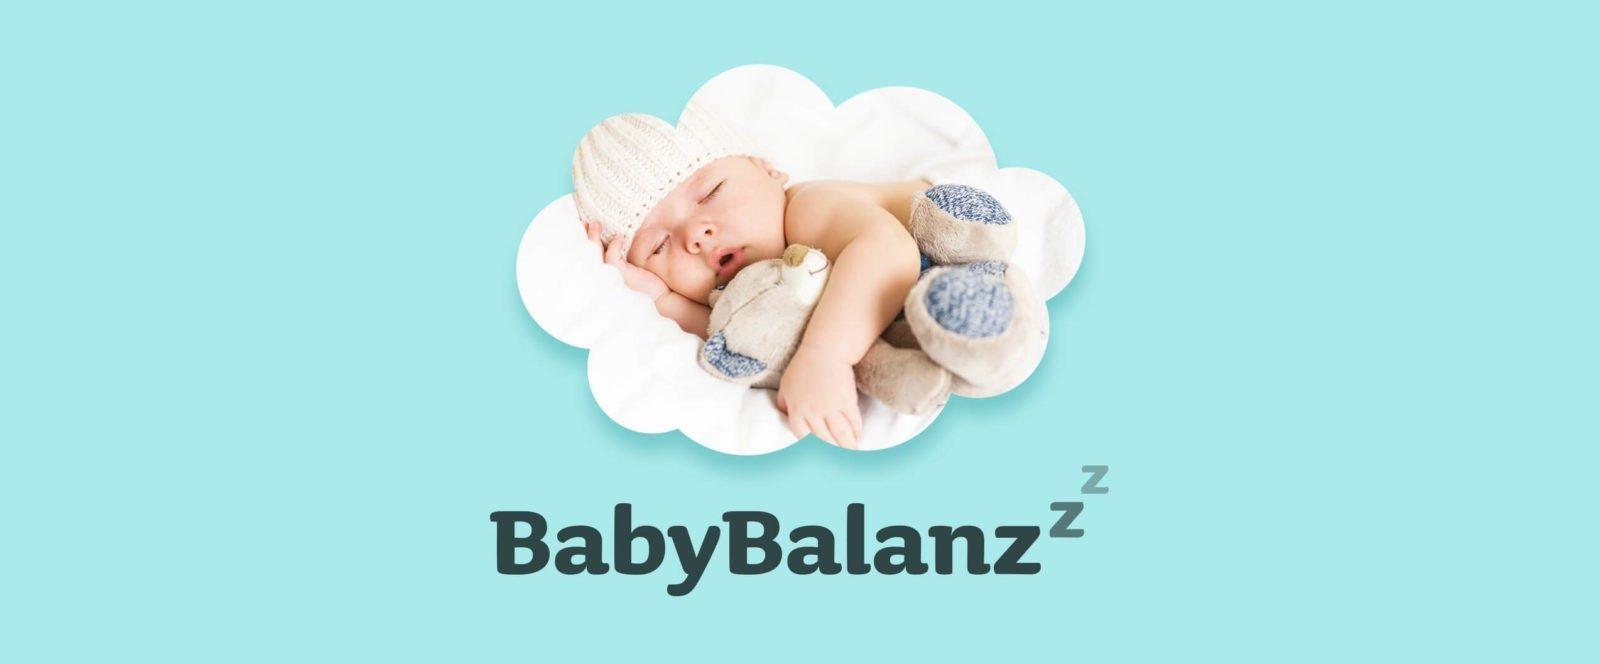 Branding de Baby Balanz